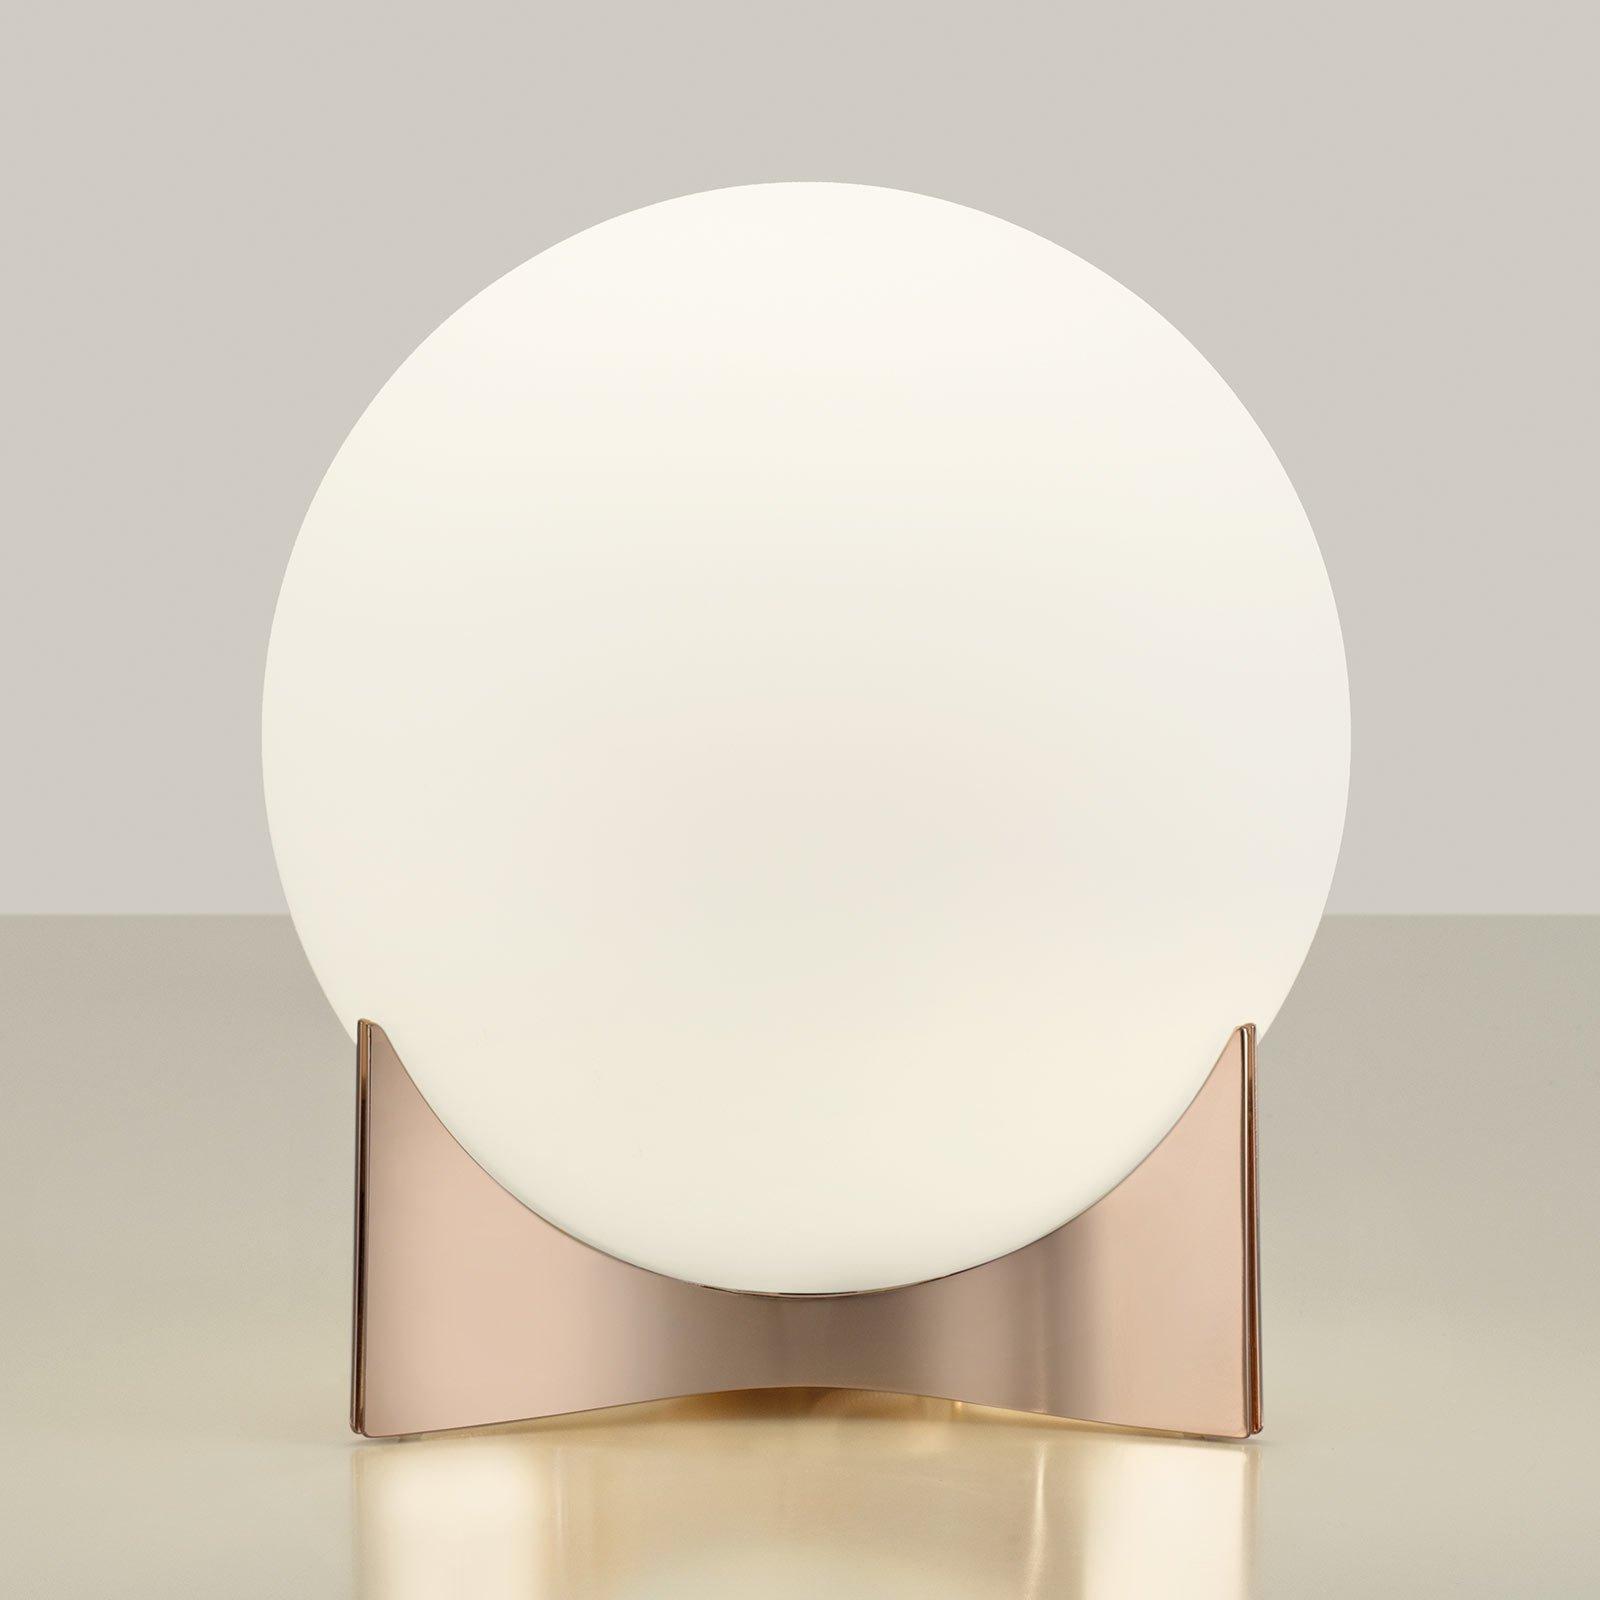 Terzani Oscar bordlampe av glass, rosegull